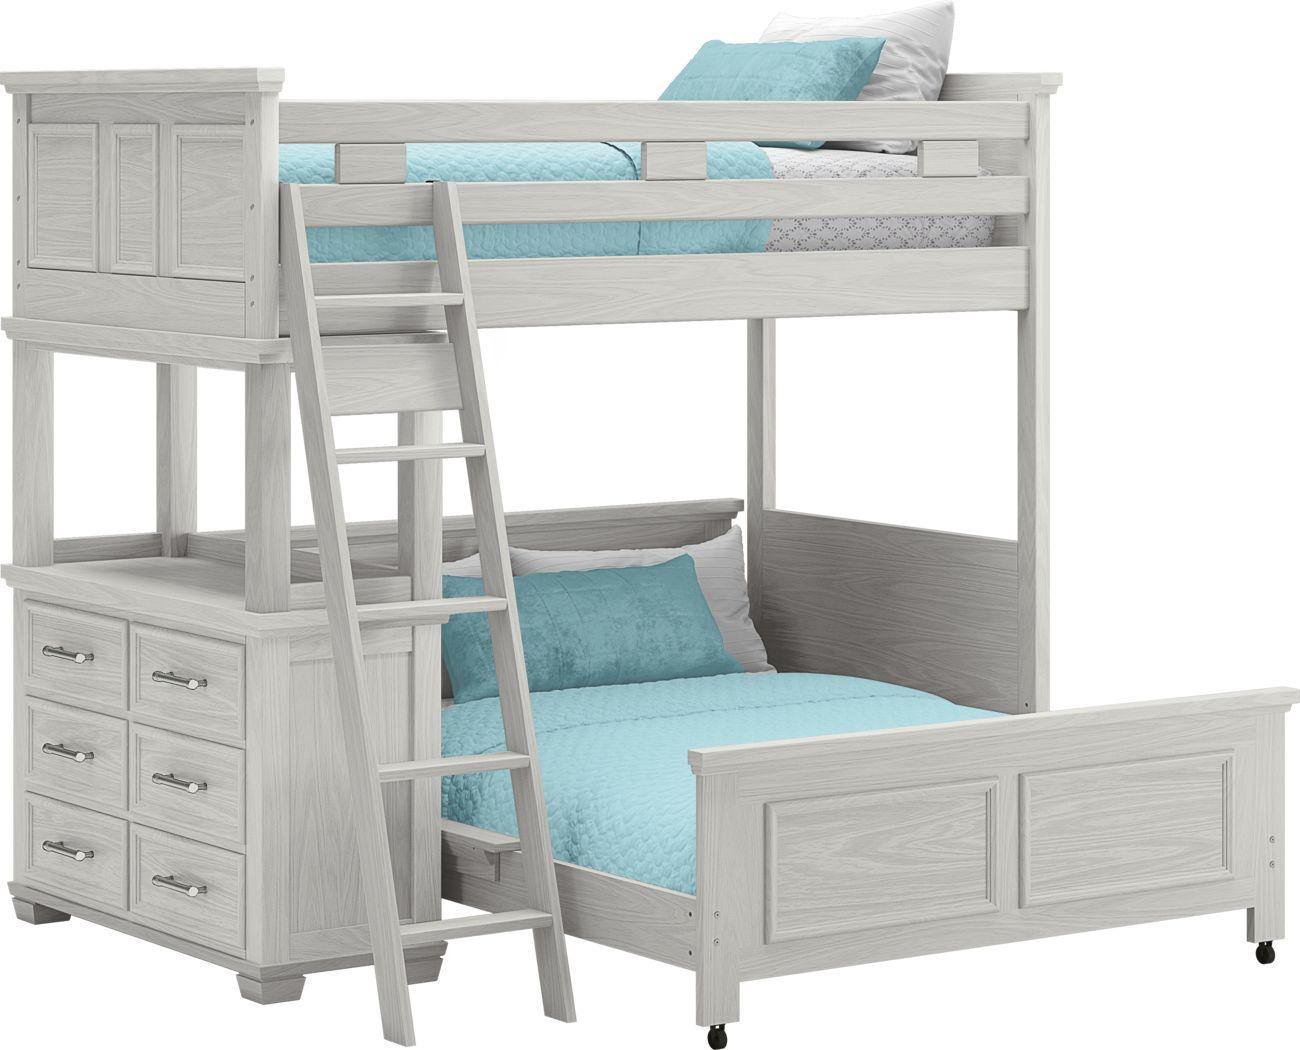 Canyon Lake Ash Gray Twin/Full Loft with Dresser